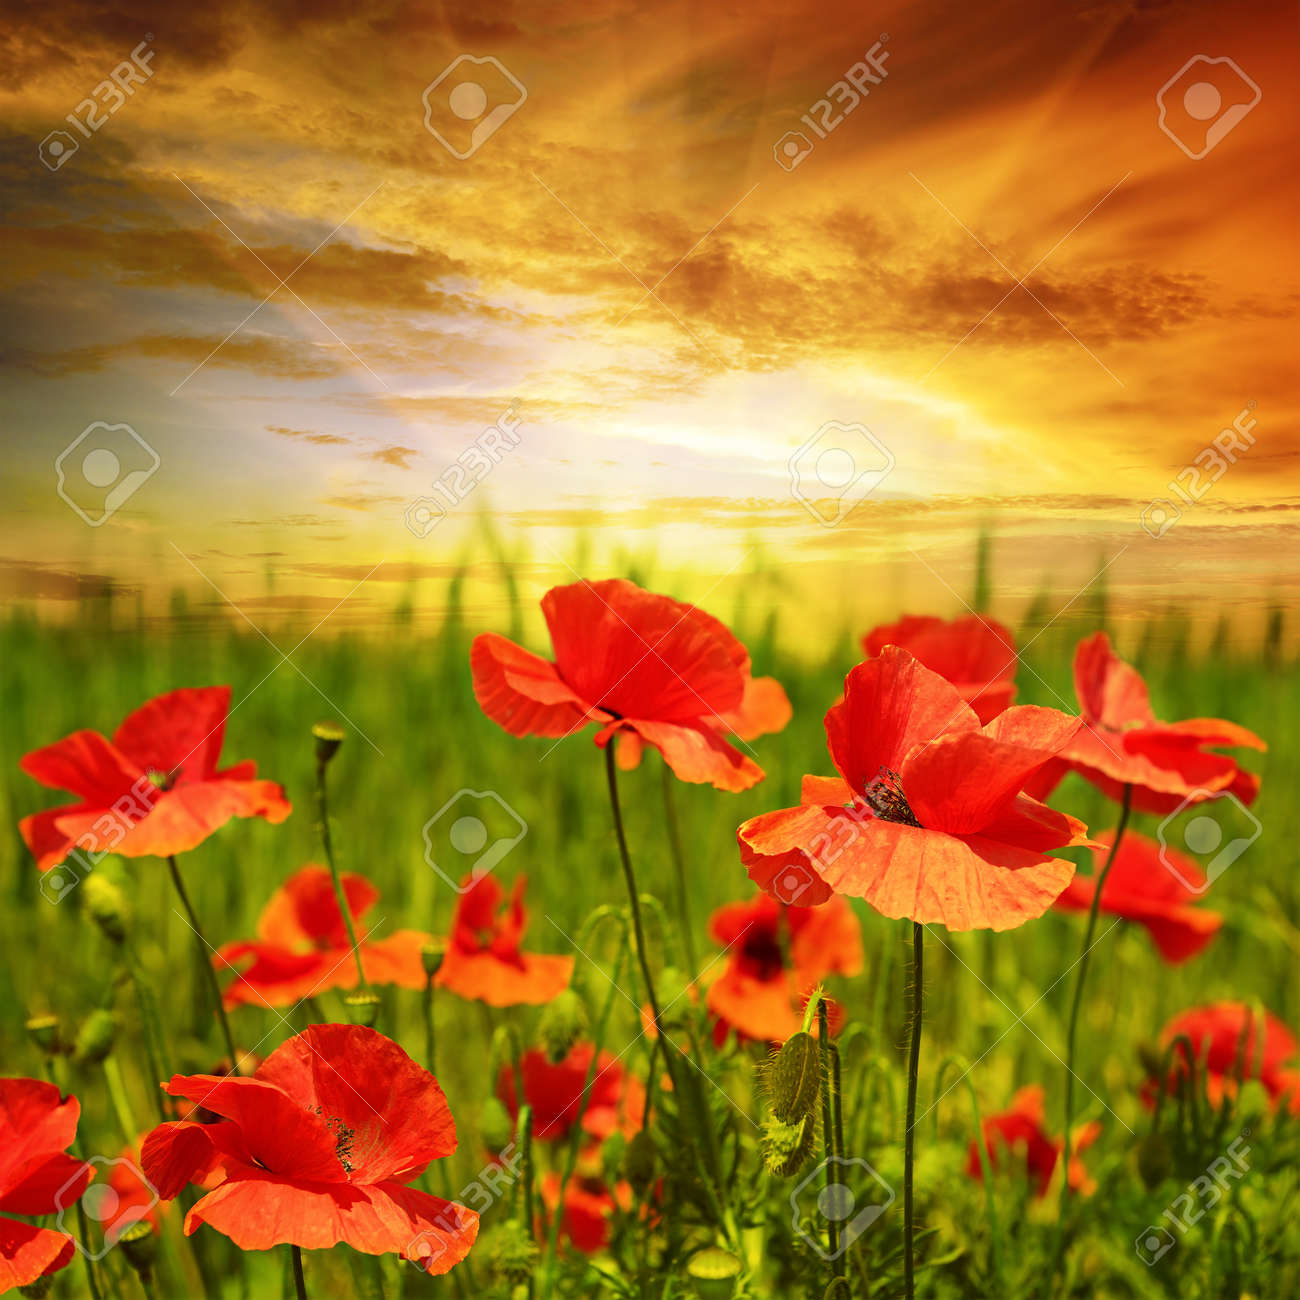 poppies field in rays sun - 34429746